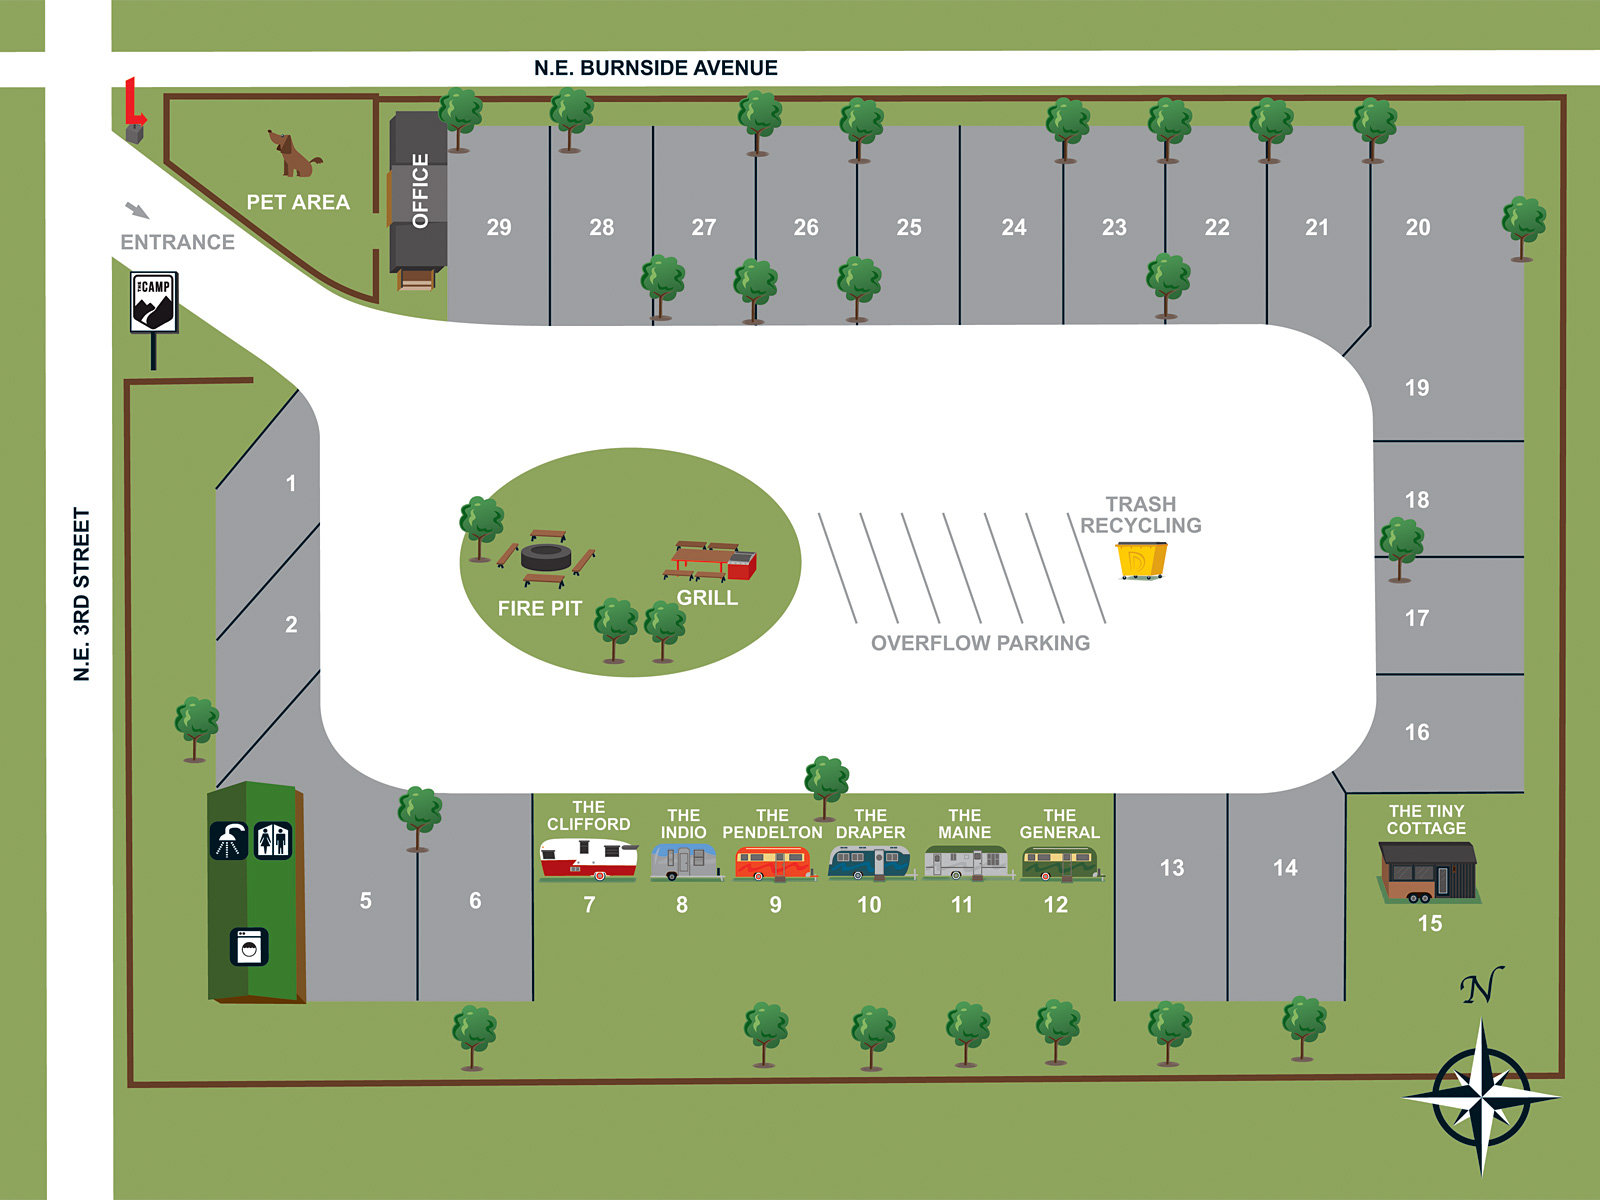 Floor Plan for Van / Small RV Pad #2 (25'D x 18'W)